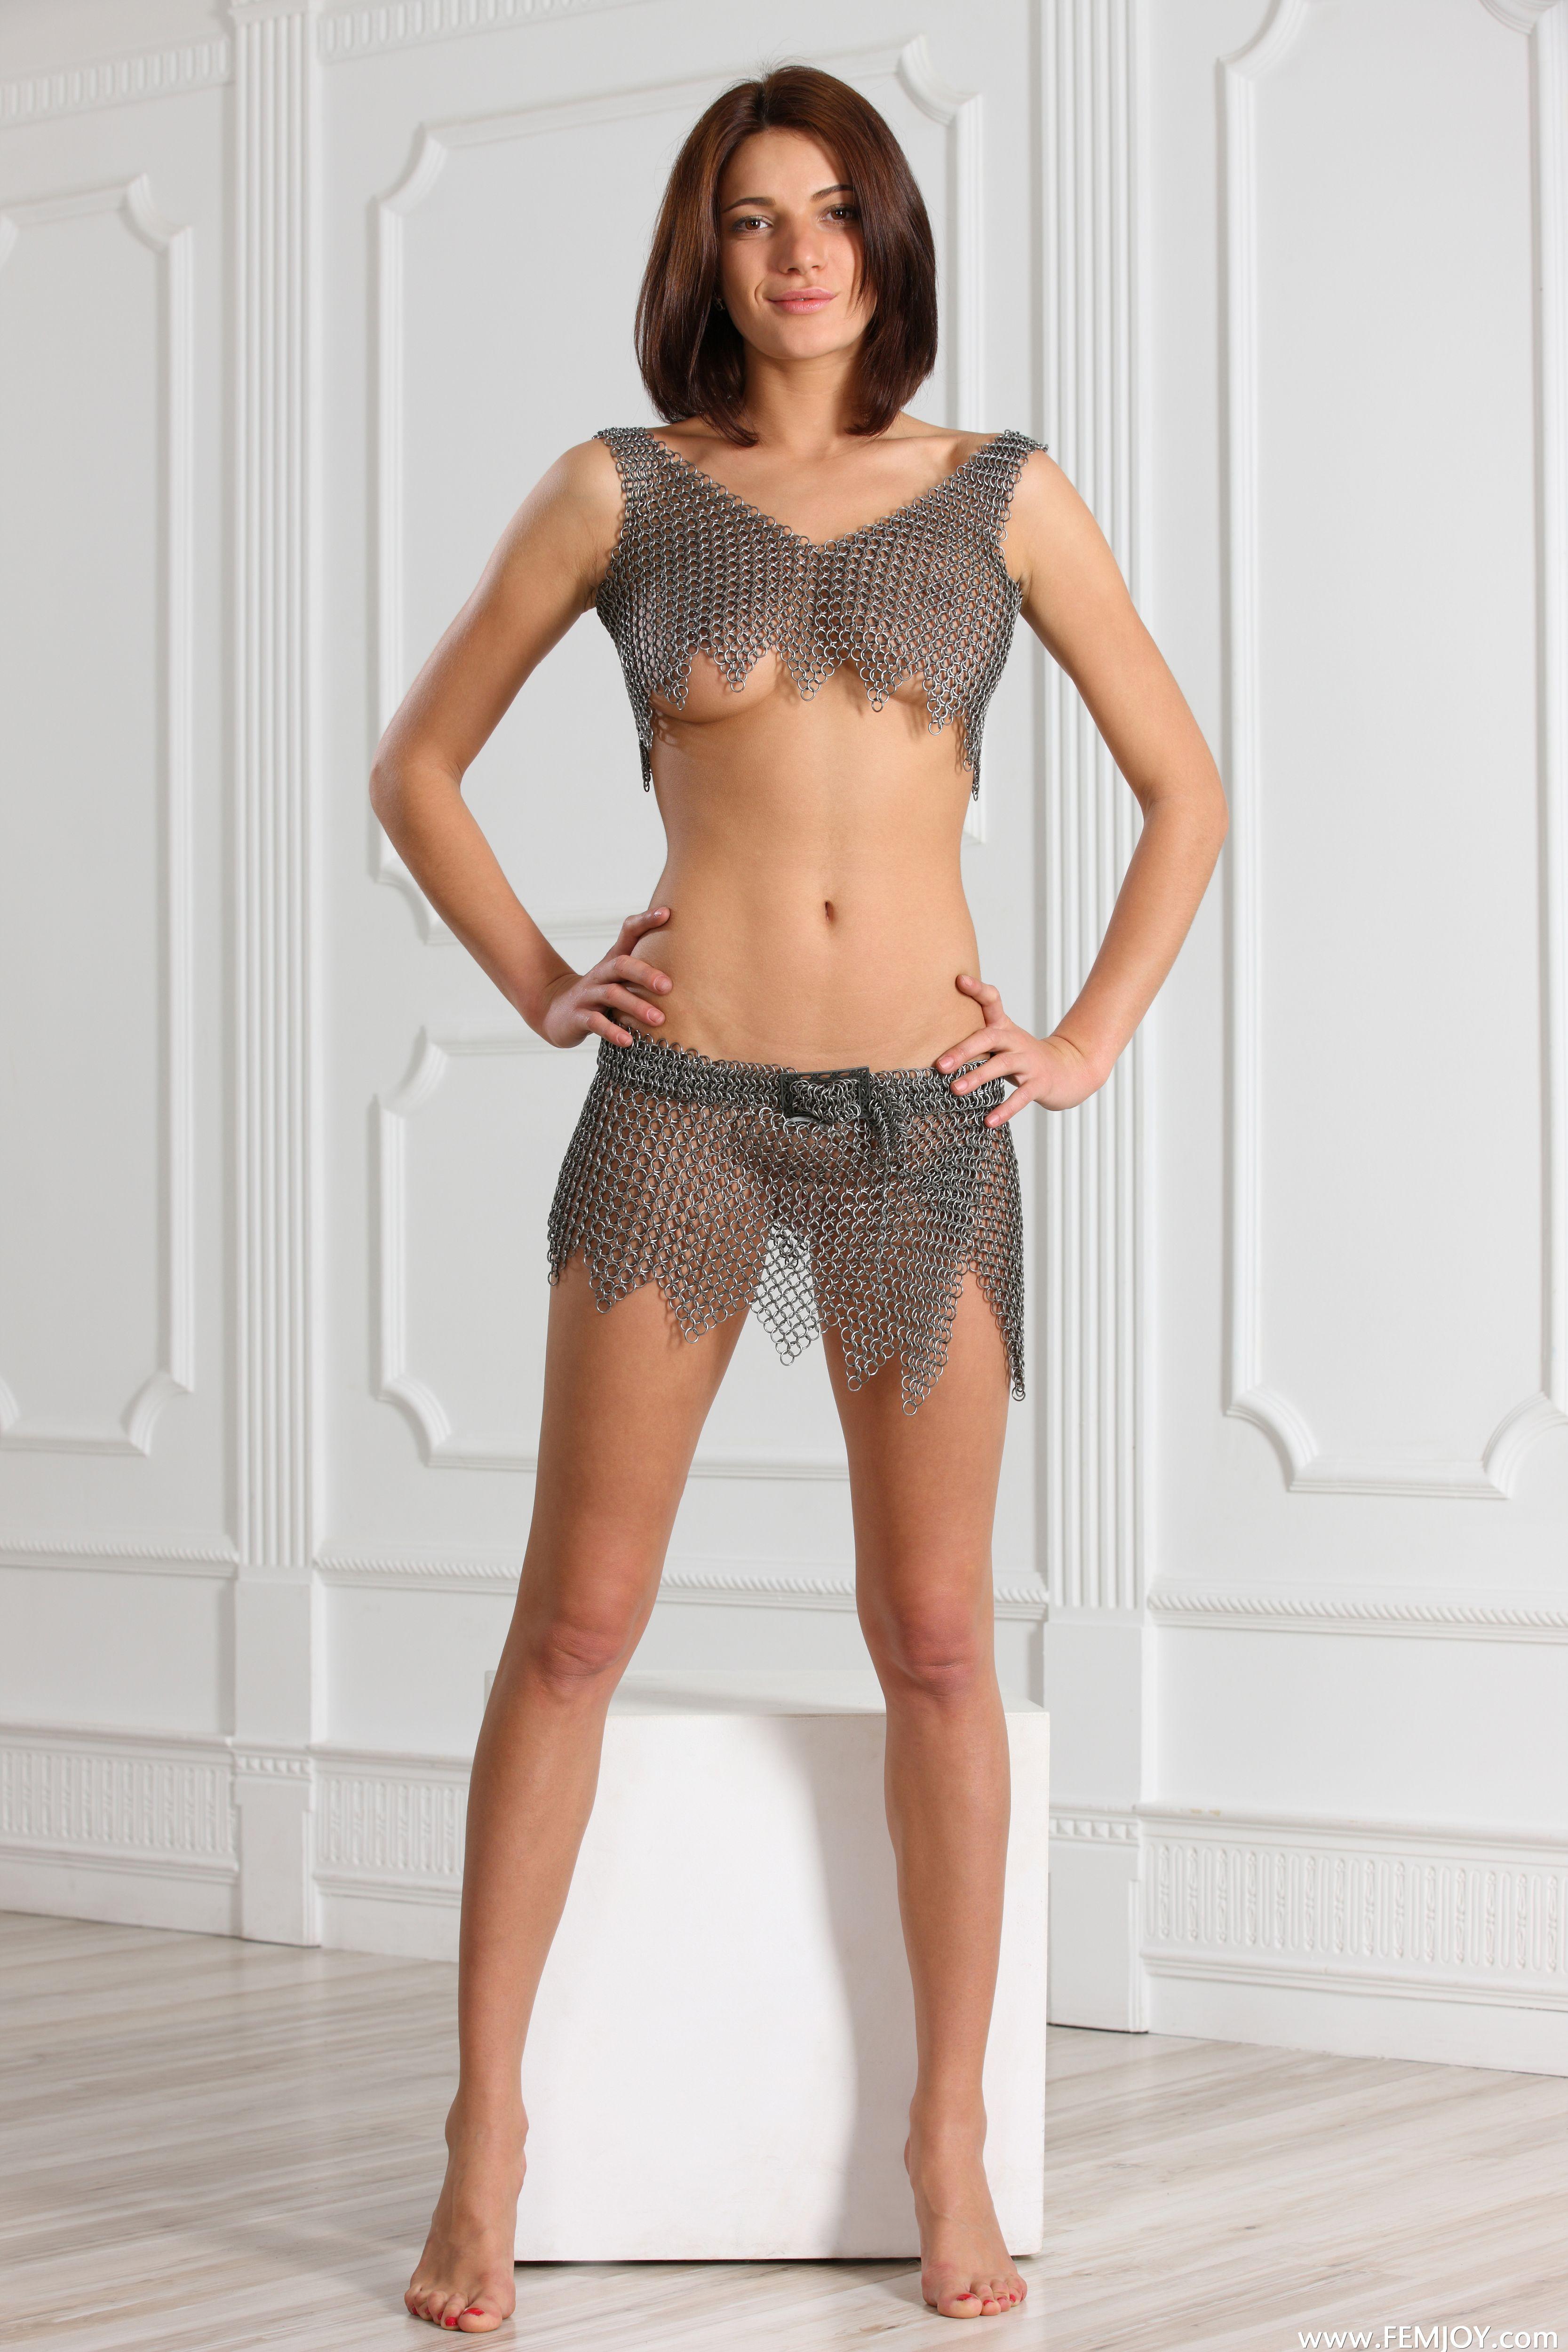 hot tan girl boot shaking naked